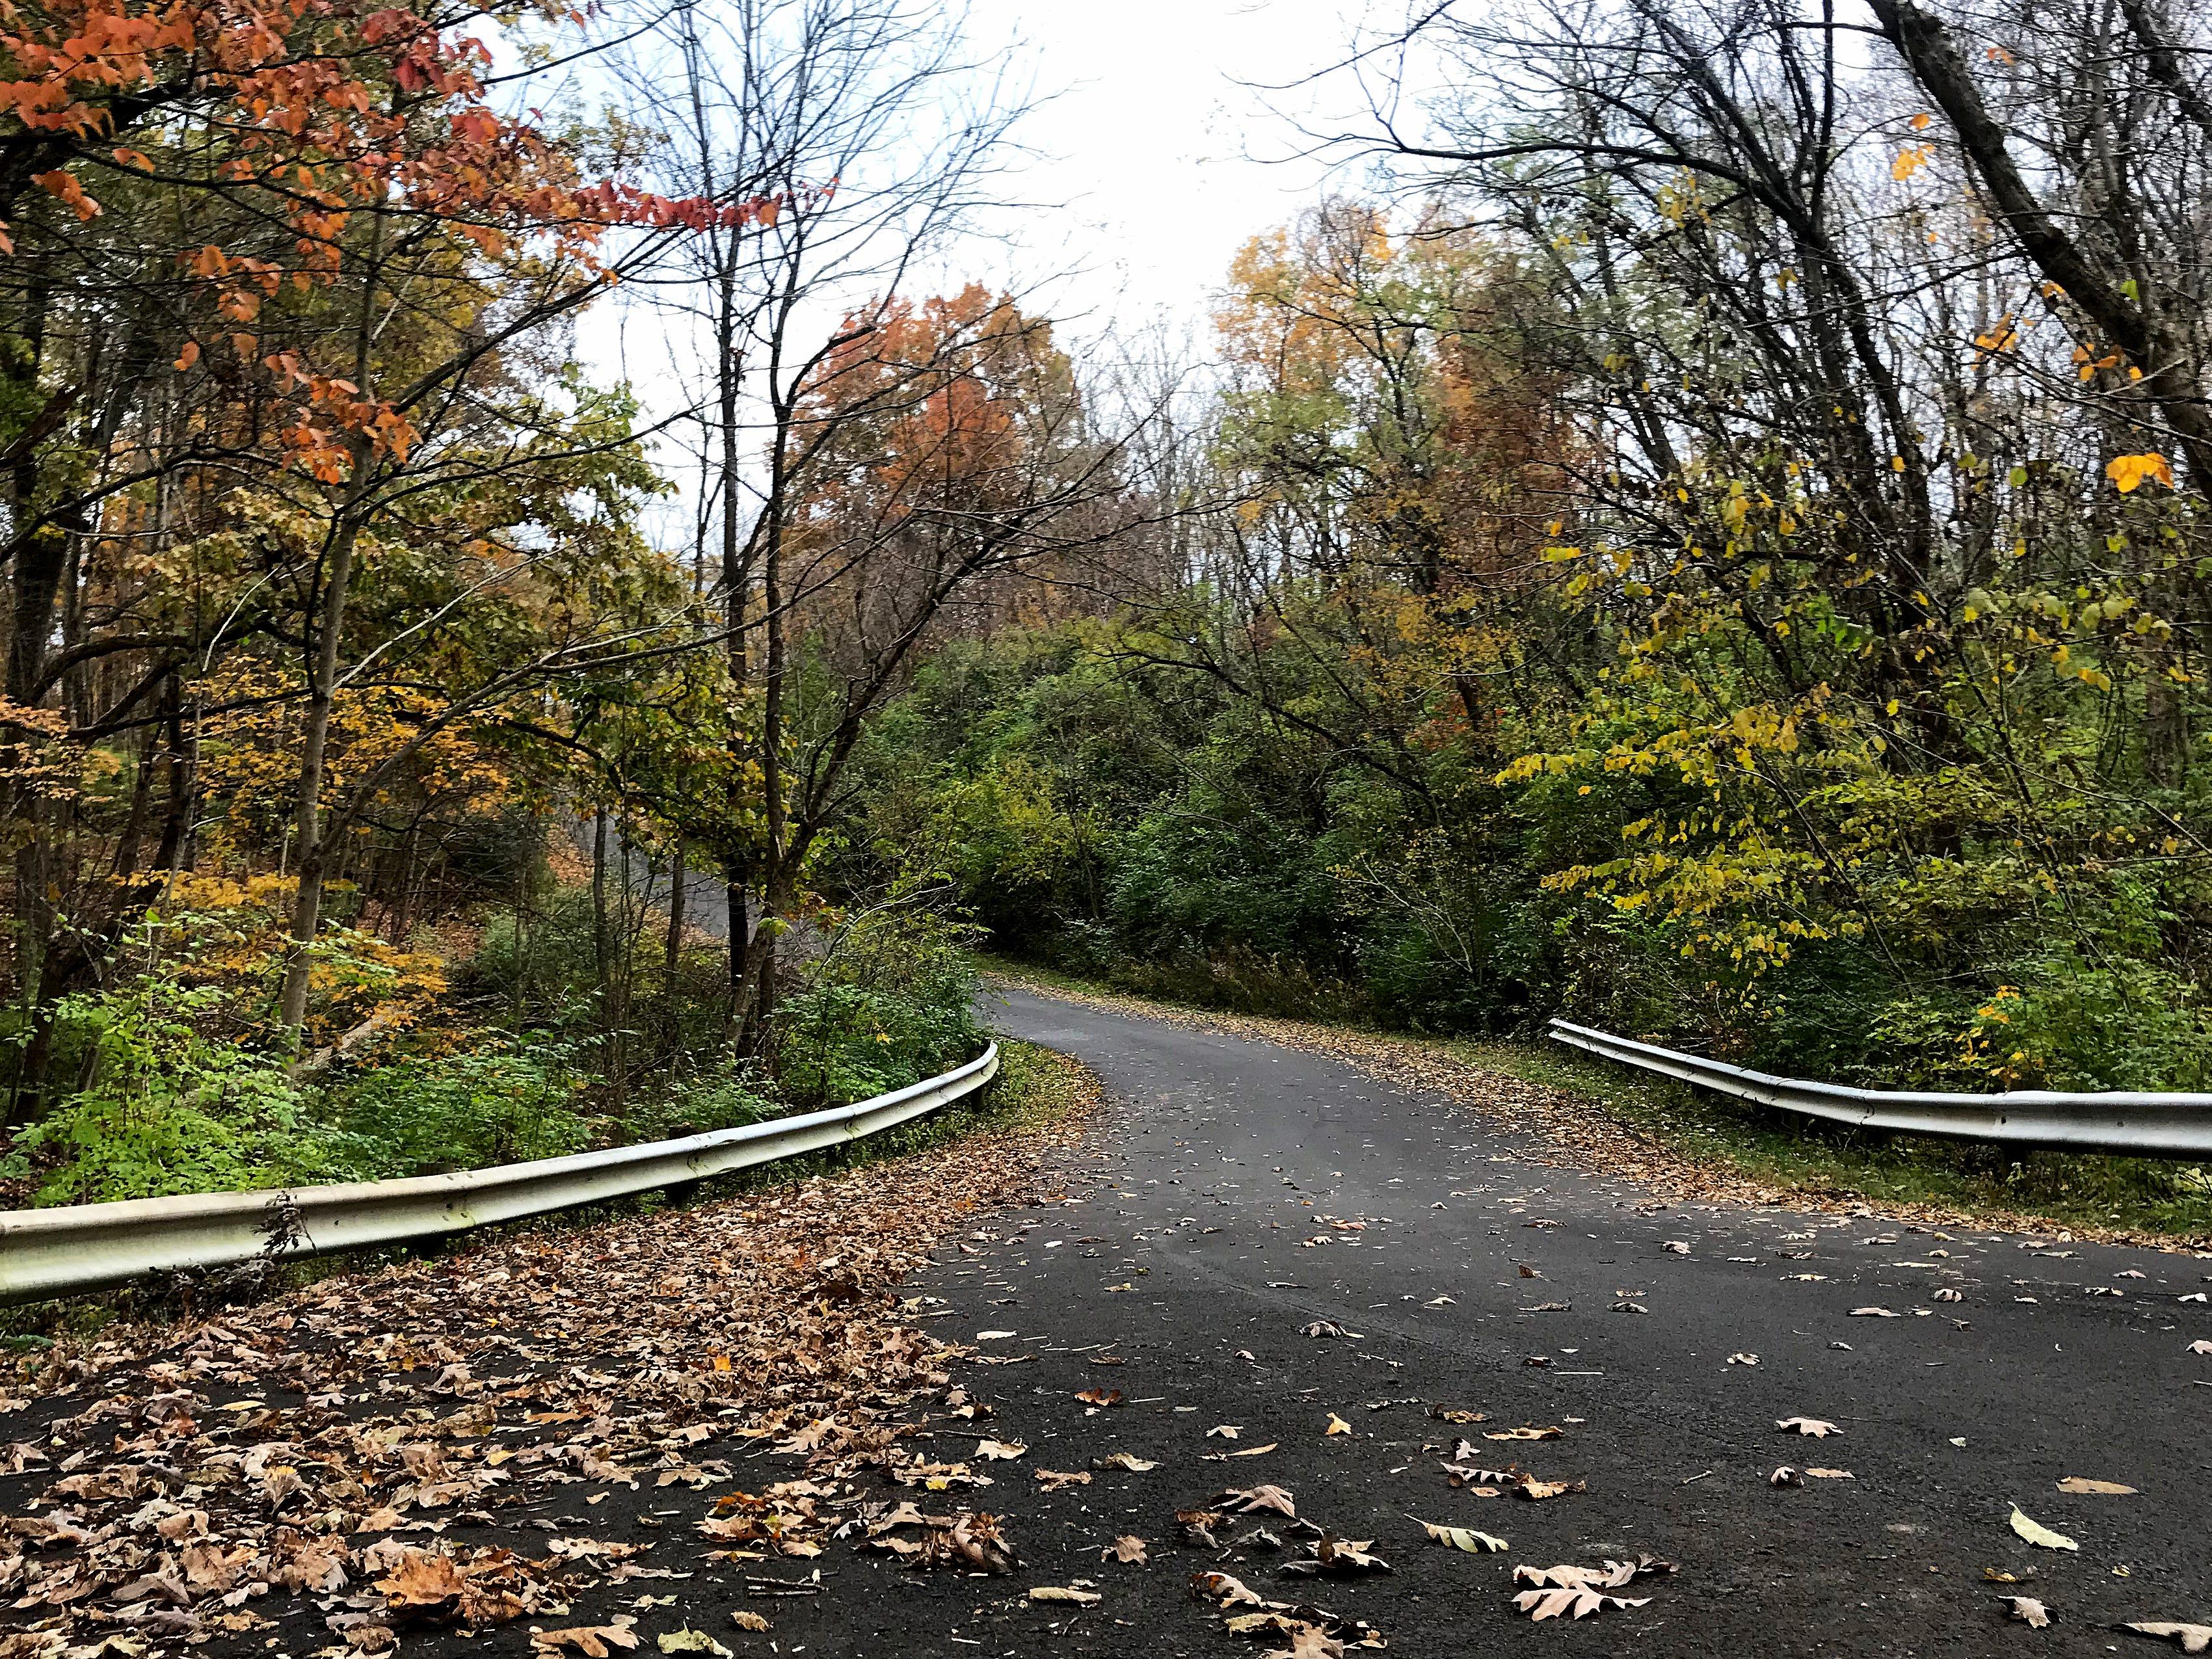 Fall colors are vivid at  Winton Woods Park Sunday, November 4, 2018.